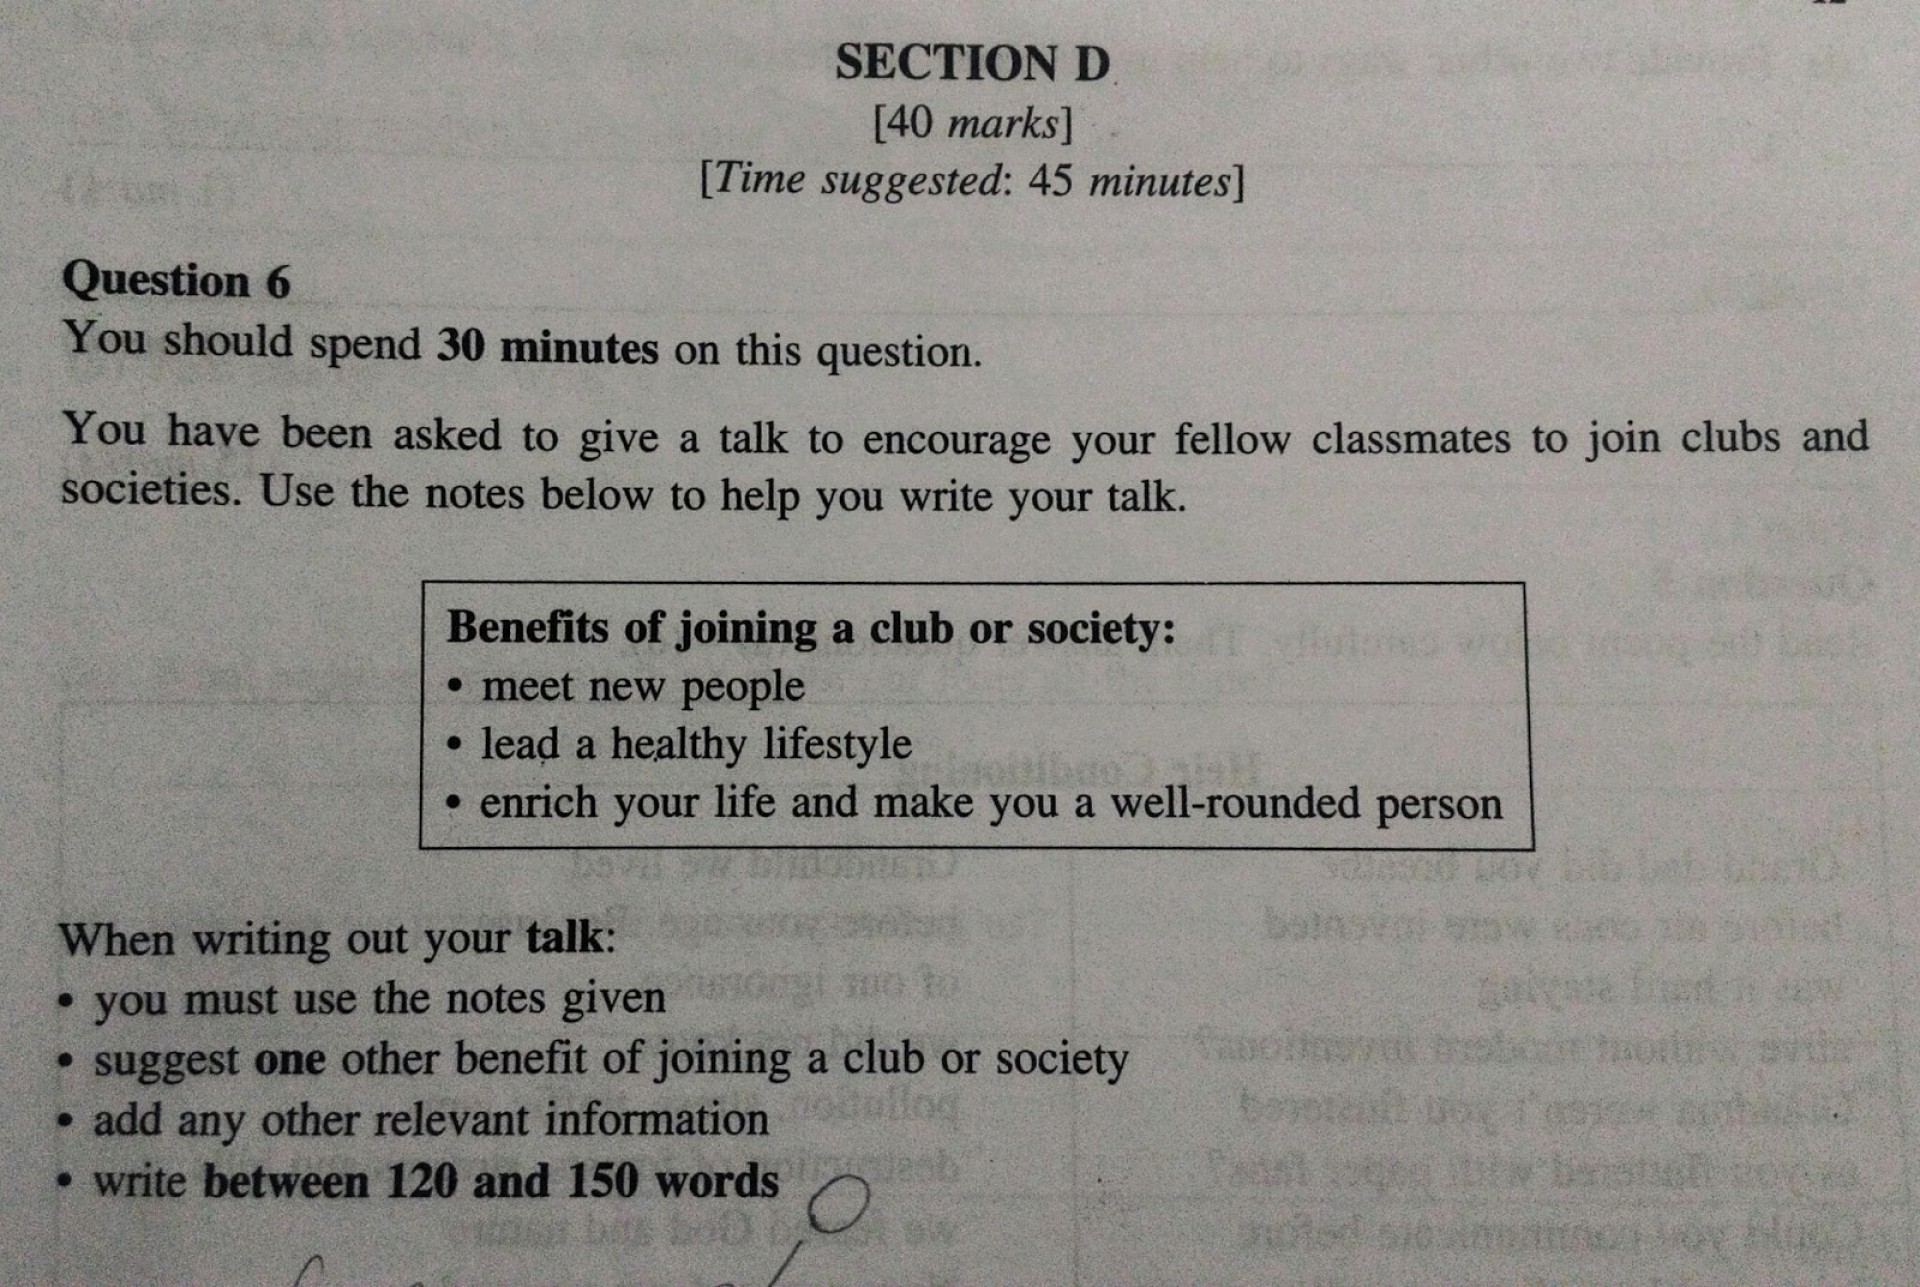 003 Essay Example Writing Good Hooks Worksheet Refrence Laws Fresh